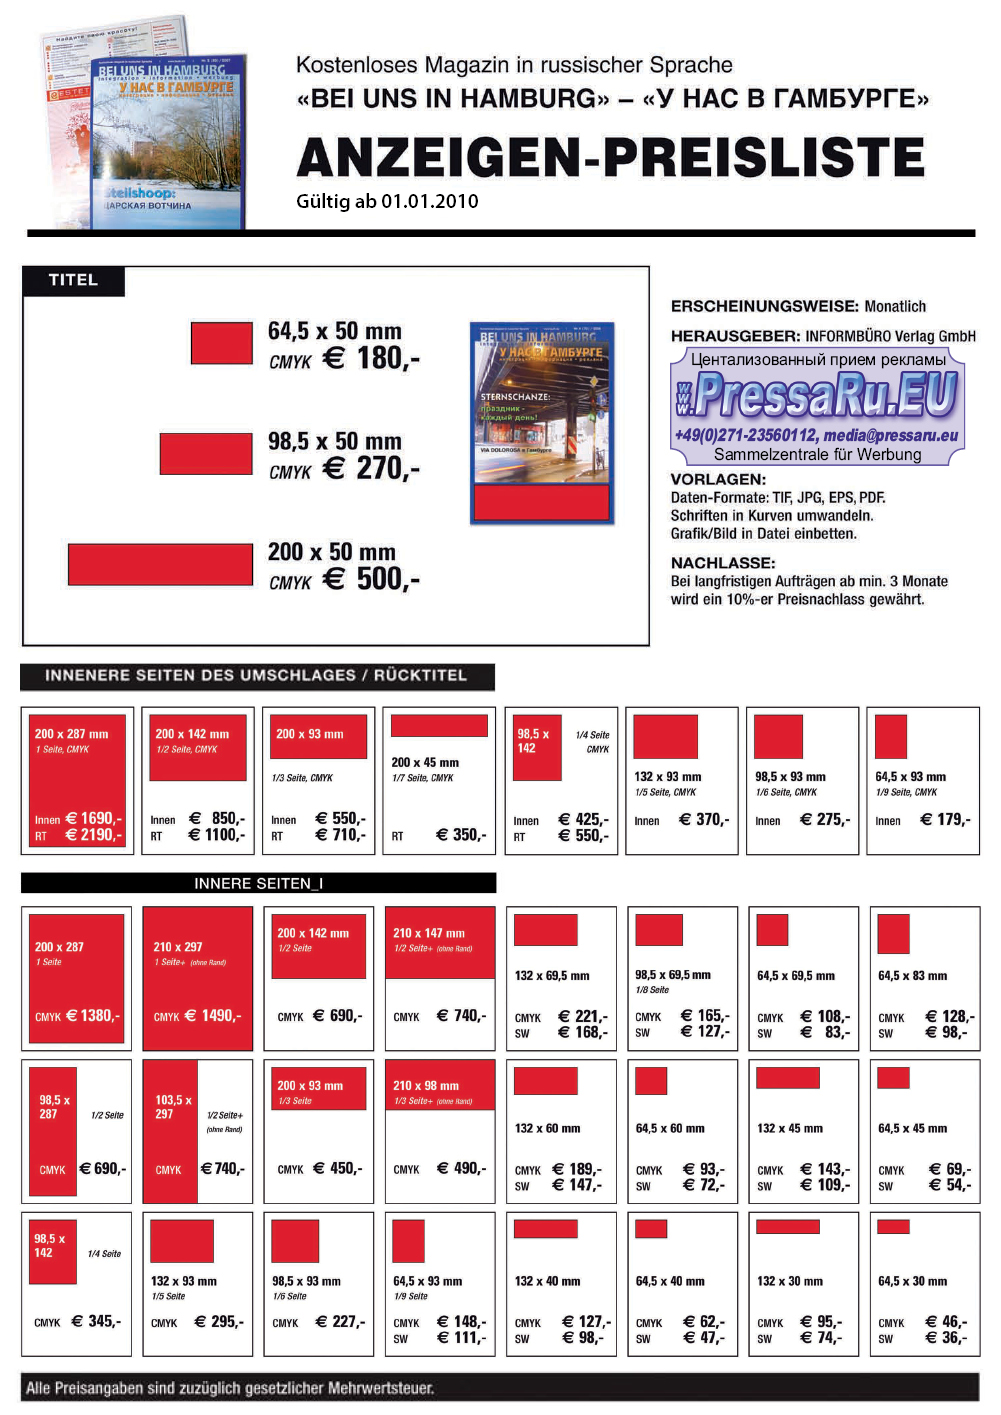 Реклама в У нас в Гамбурге (журнал), цены